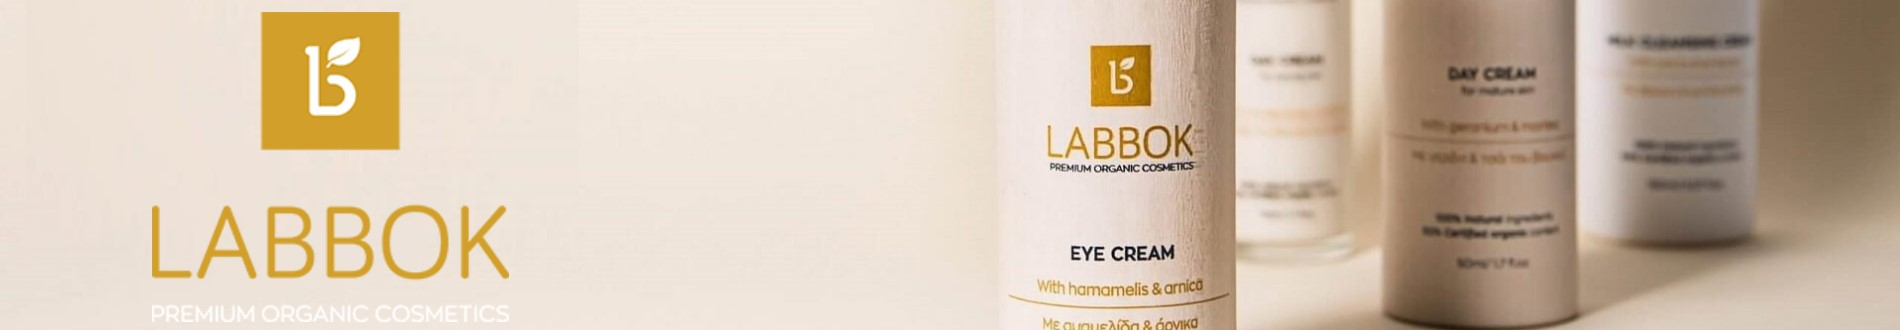 Labbok cosmetics